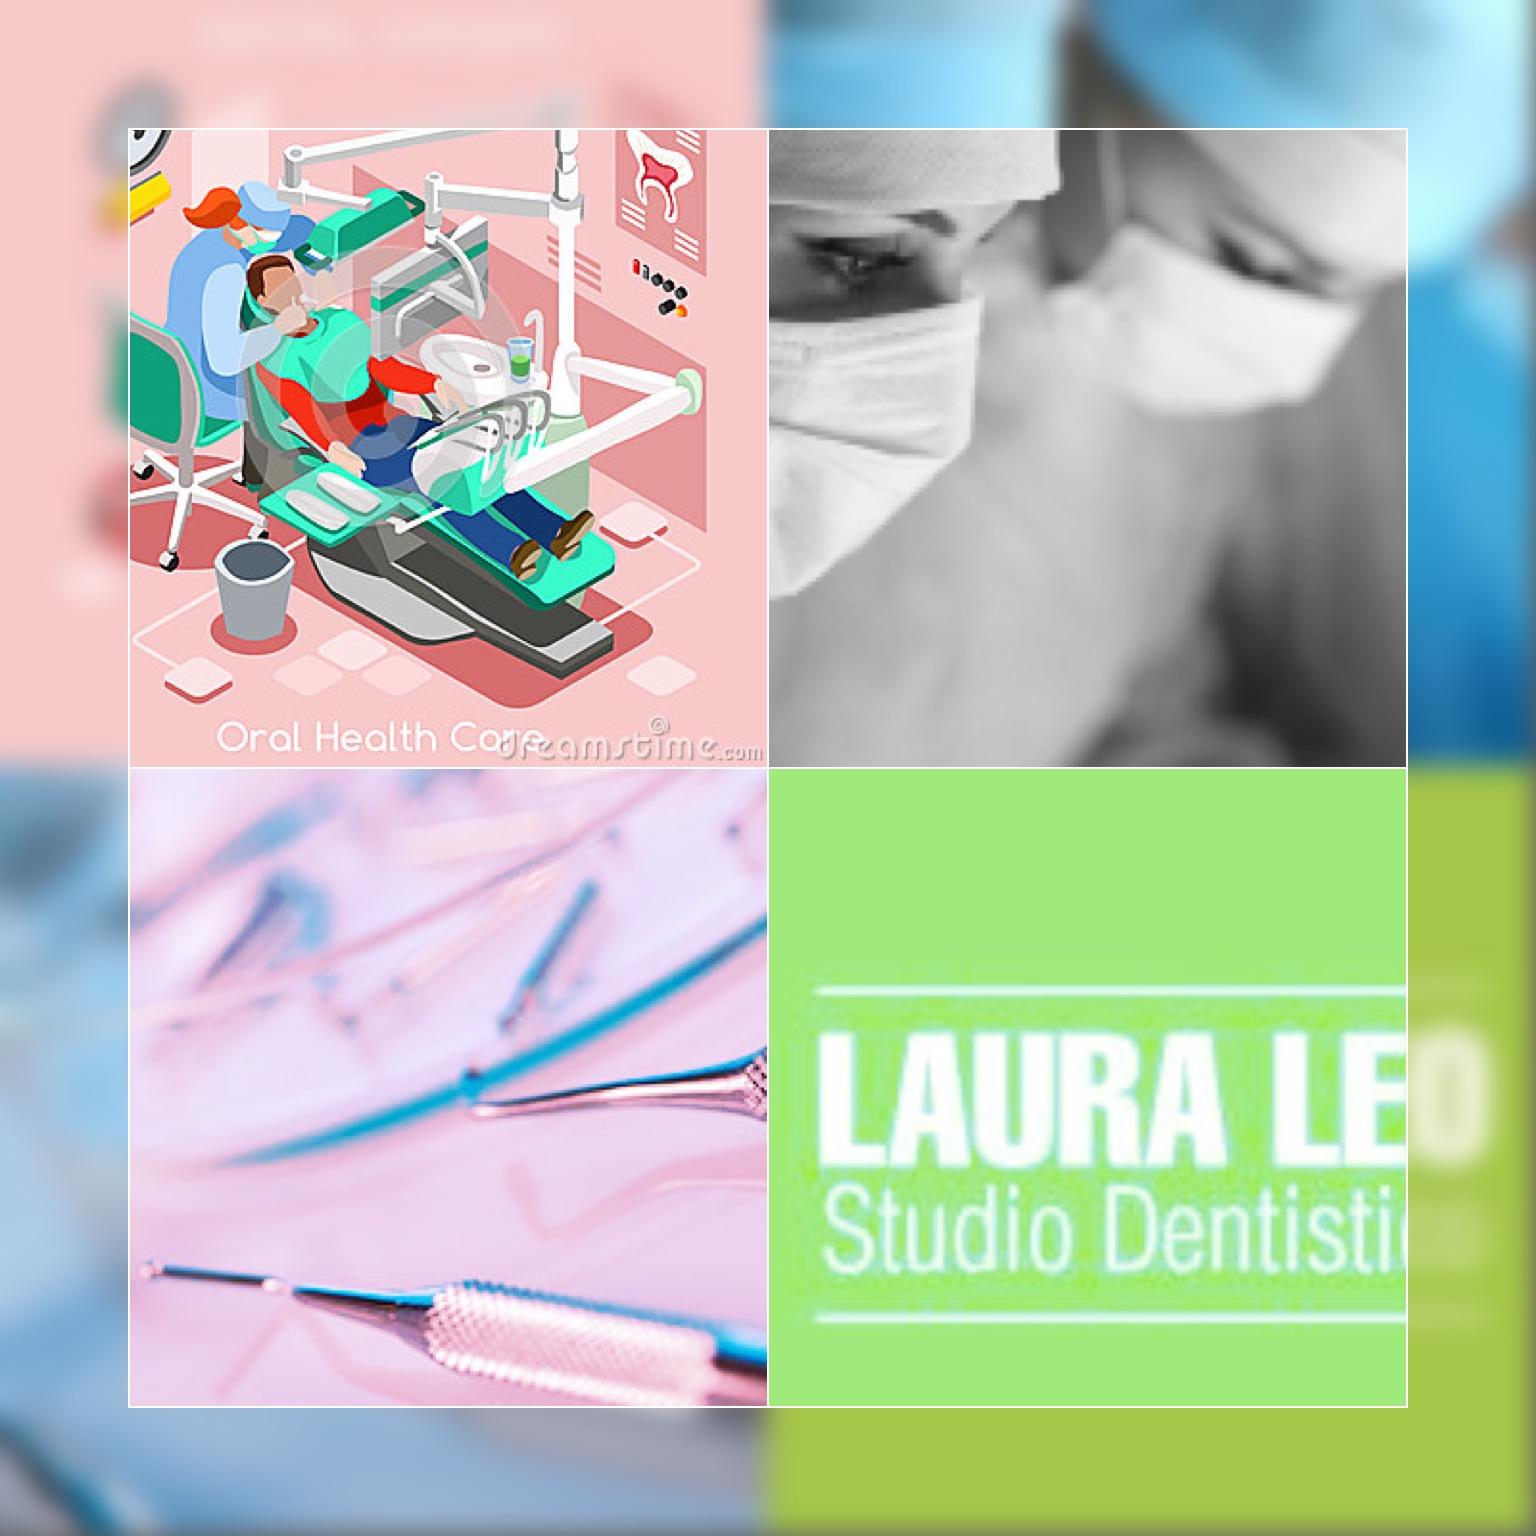 Studio Dentistico Laura Leo - Terapie - CHIRURGIA ODONTOSTOMATOLOGICA